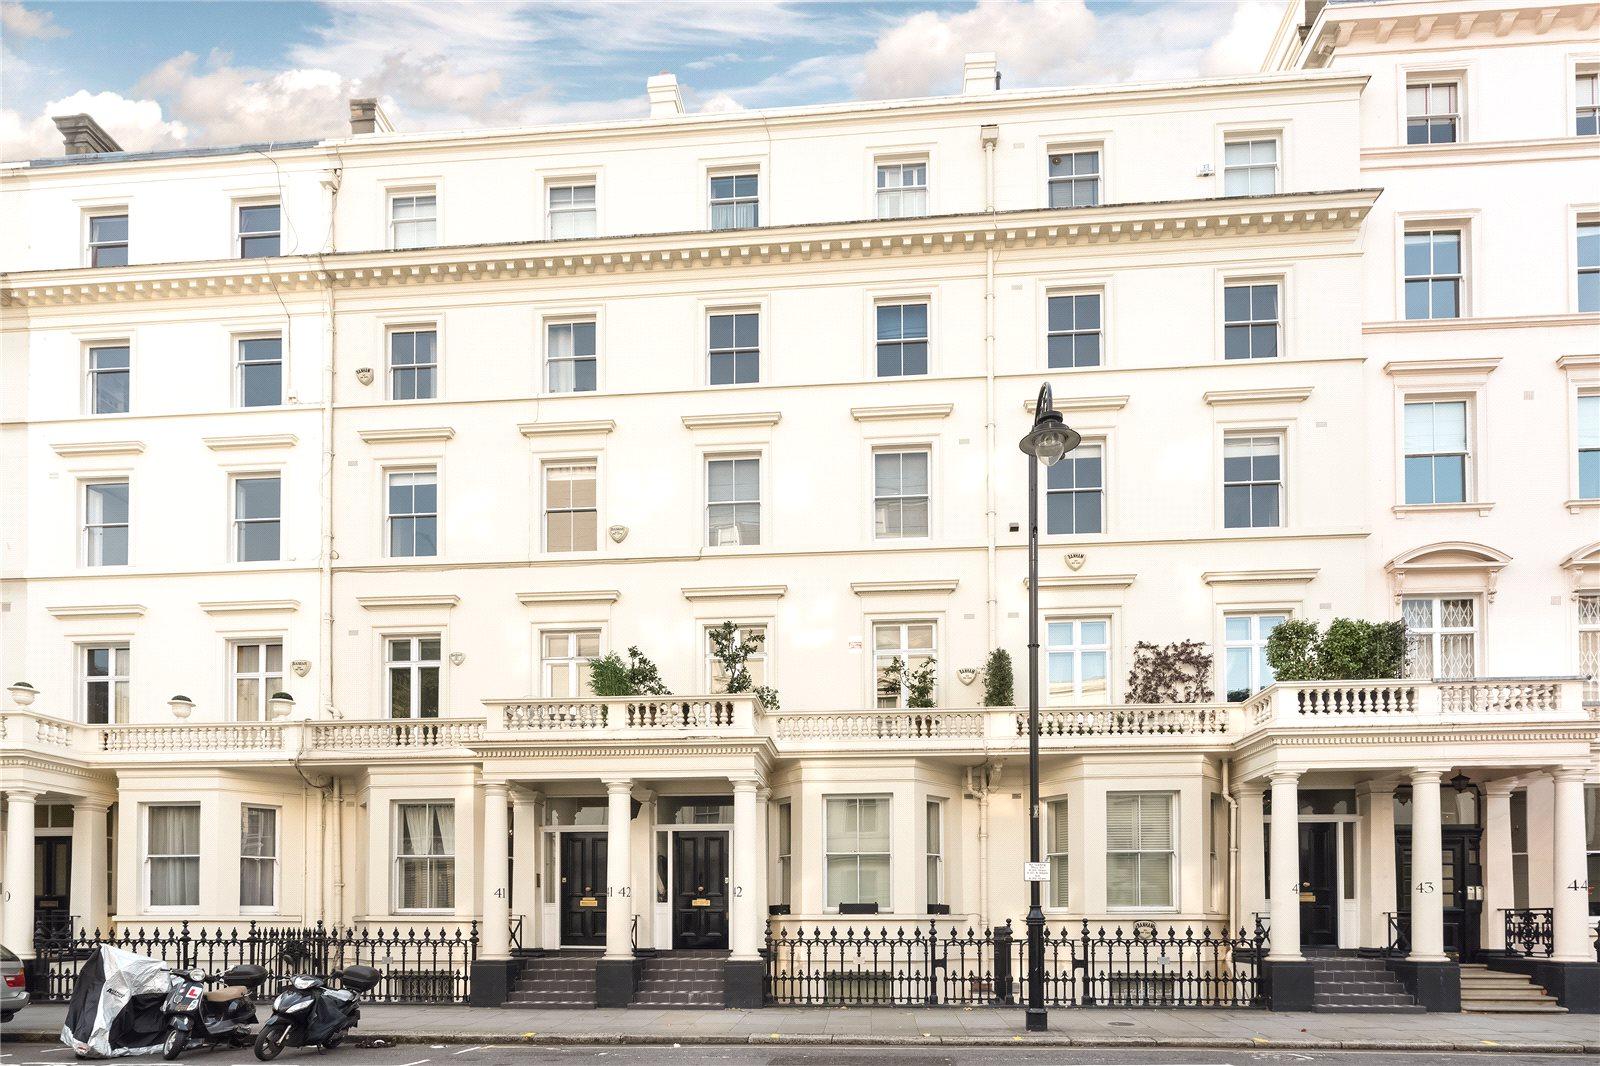 Апартаменты / Квартиры для того Продажа на Stanhope Gardens, South Kensington, London, SW7 South Kensington, London, Англия